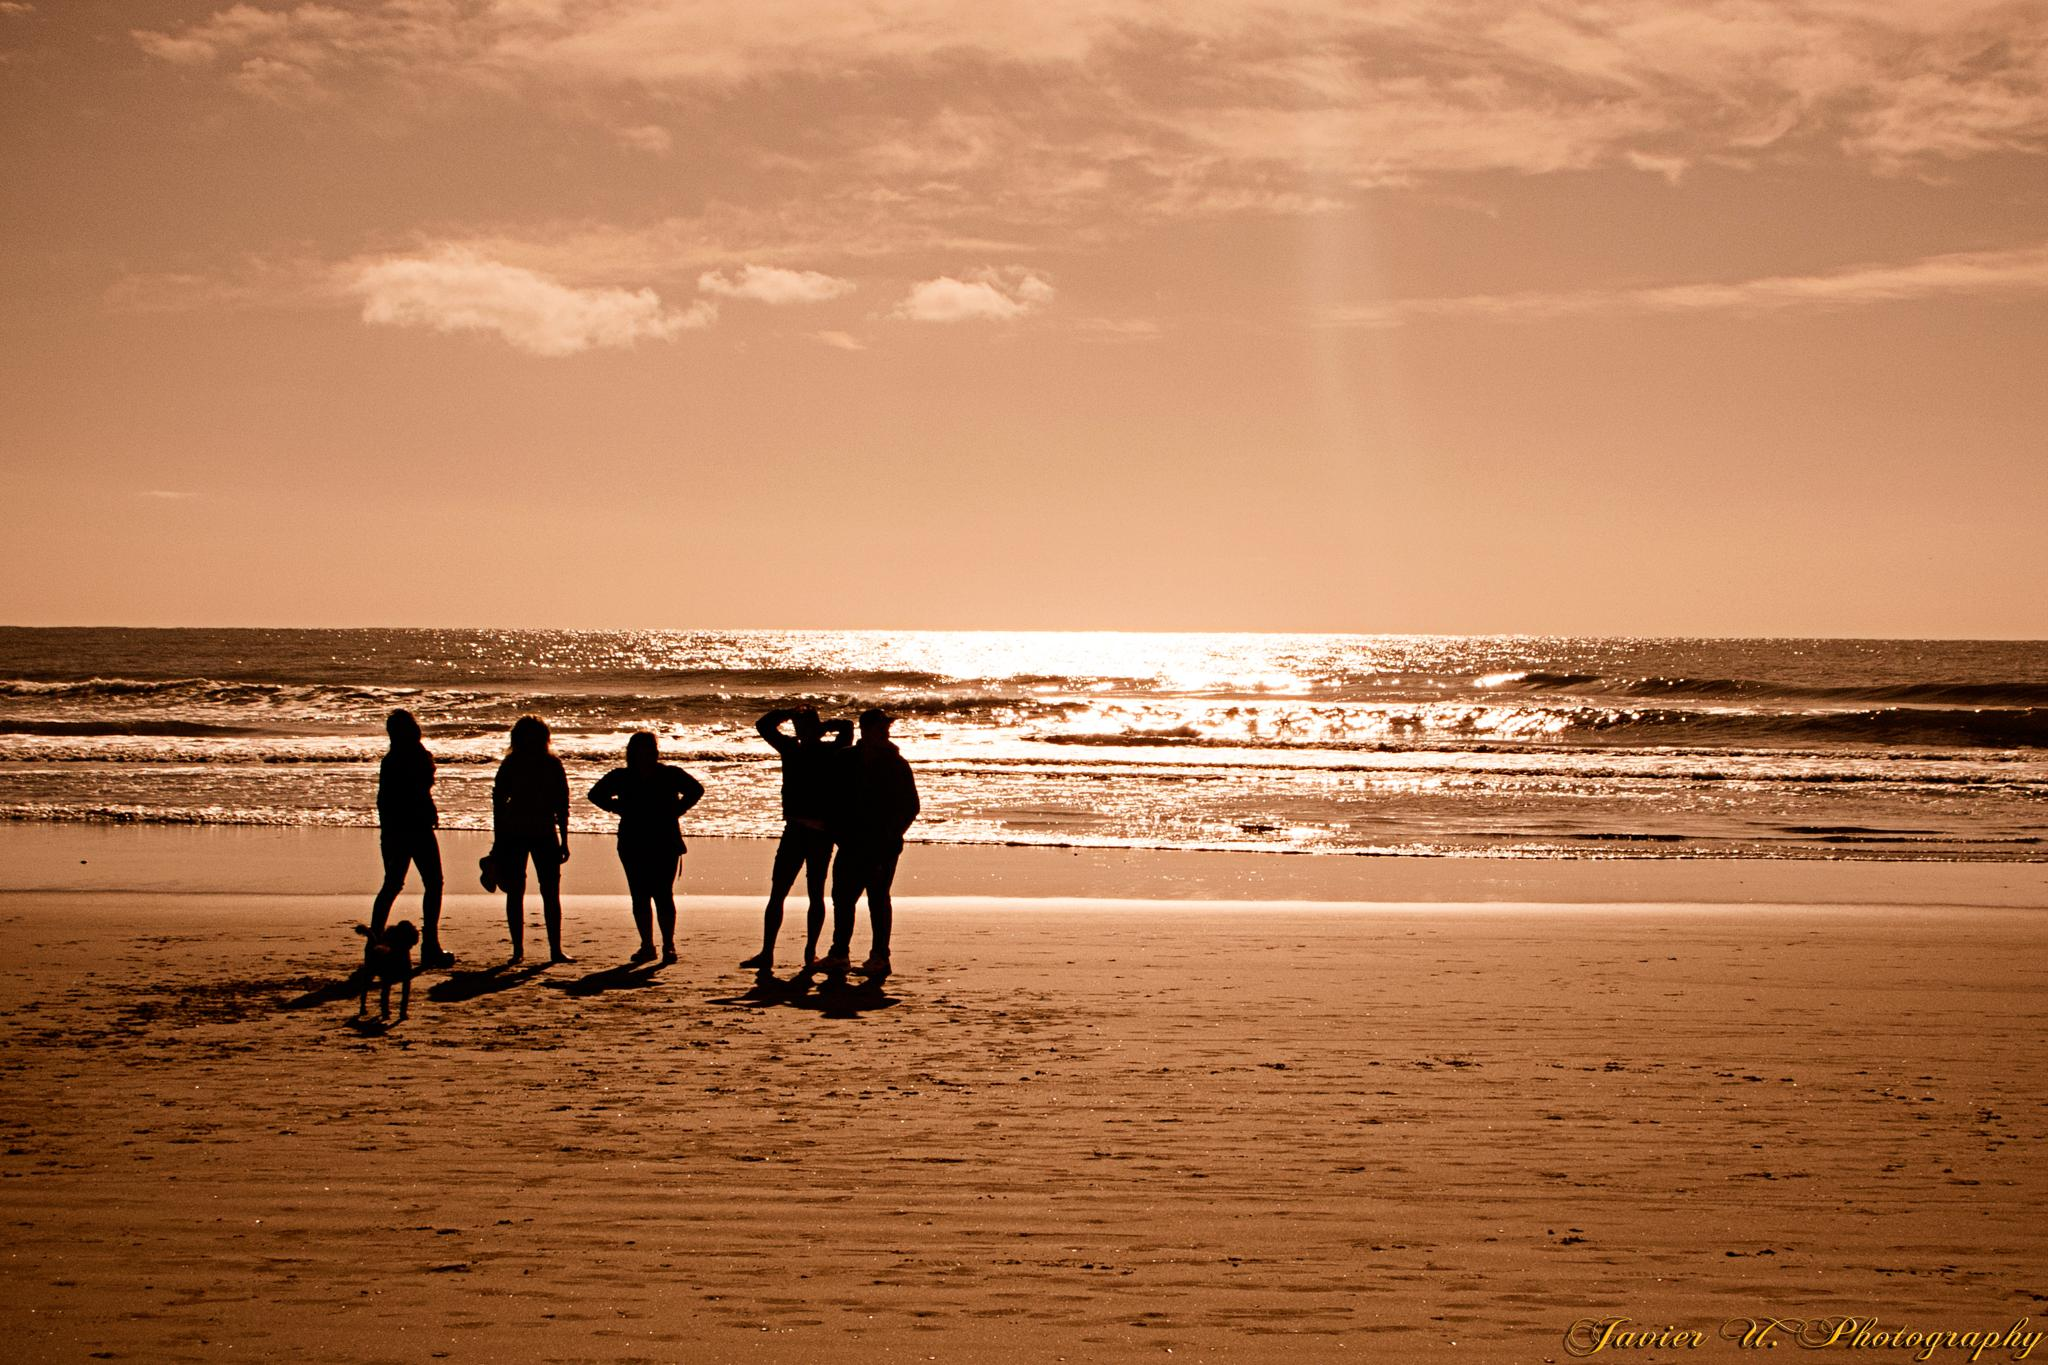 playa 2 by Chirolin72